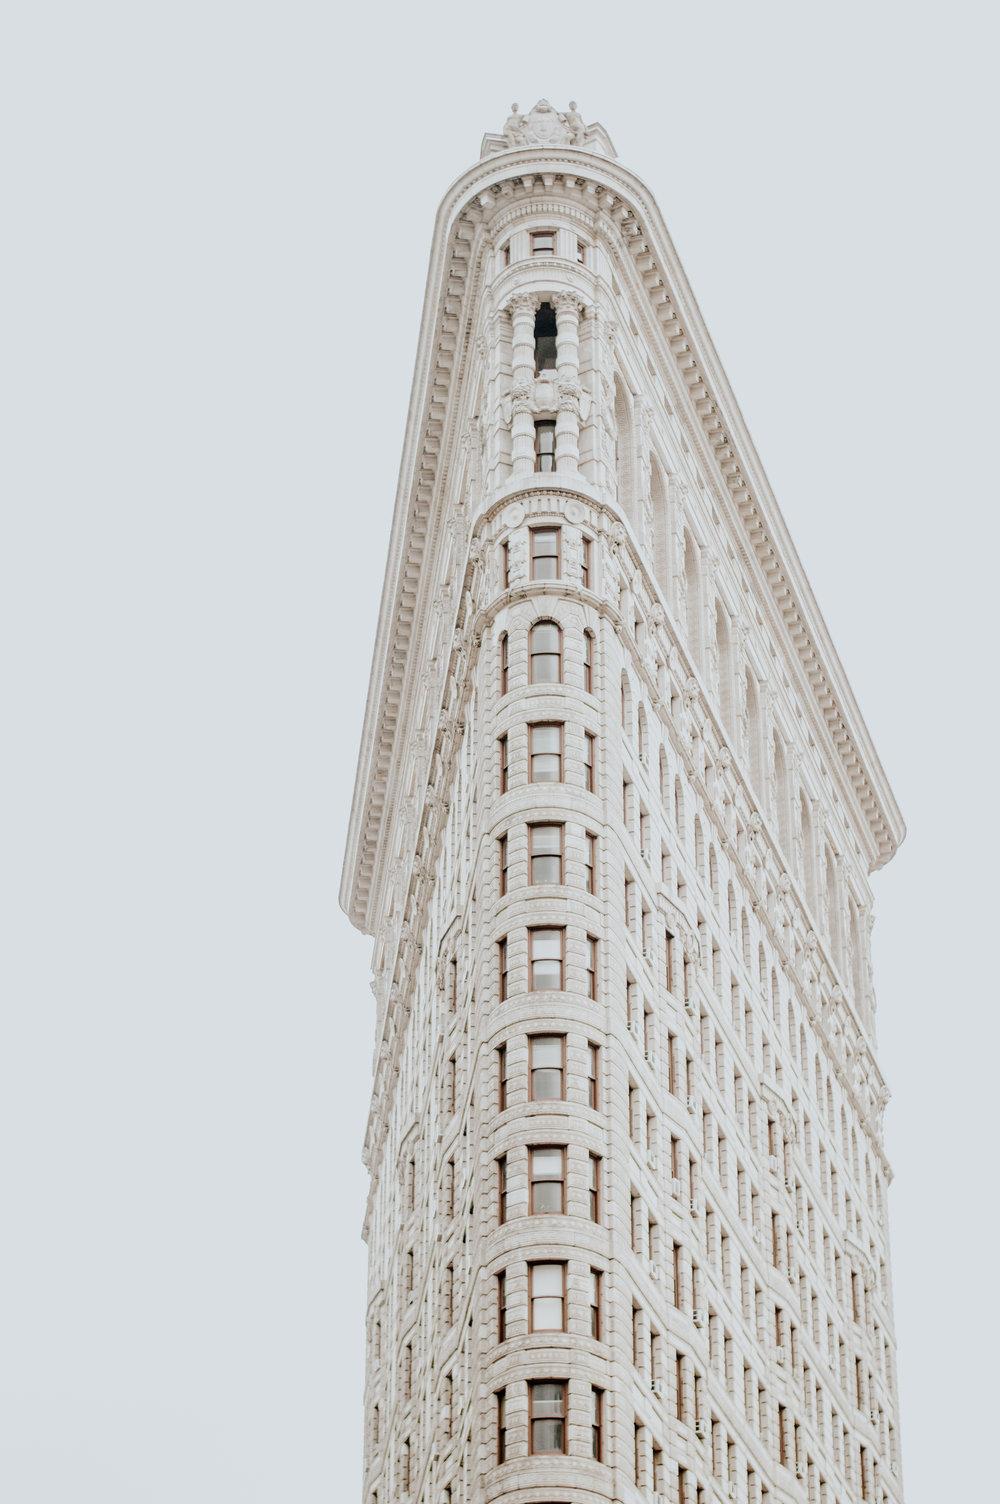 The infamous Flatiron Building